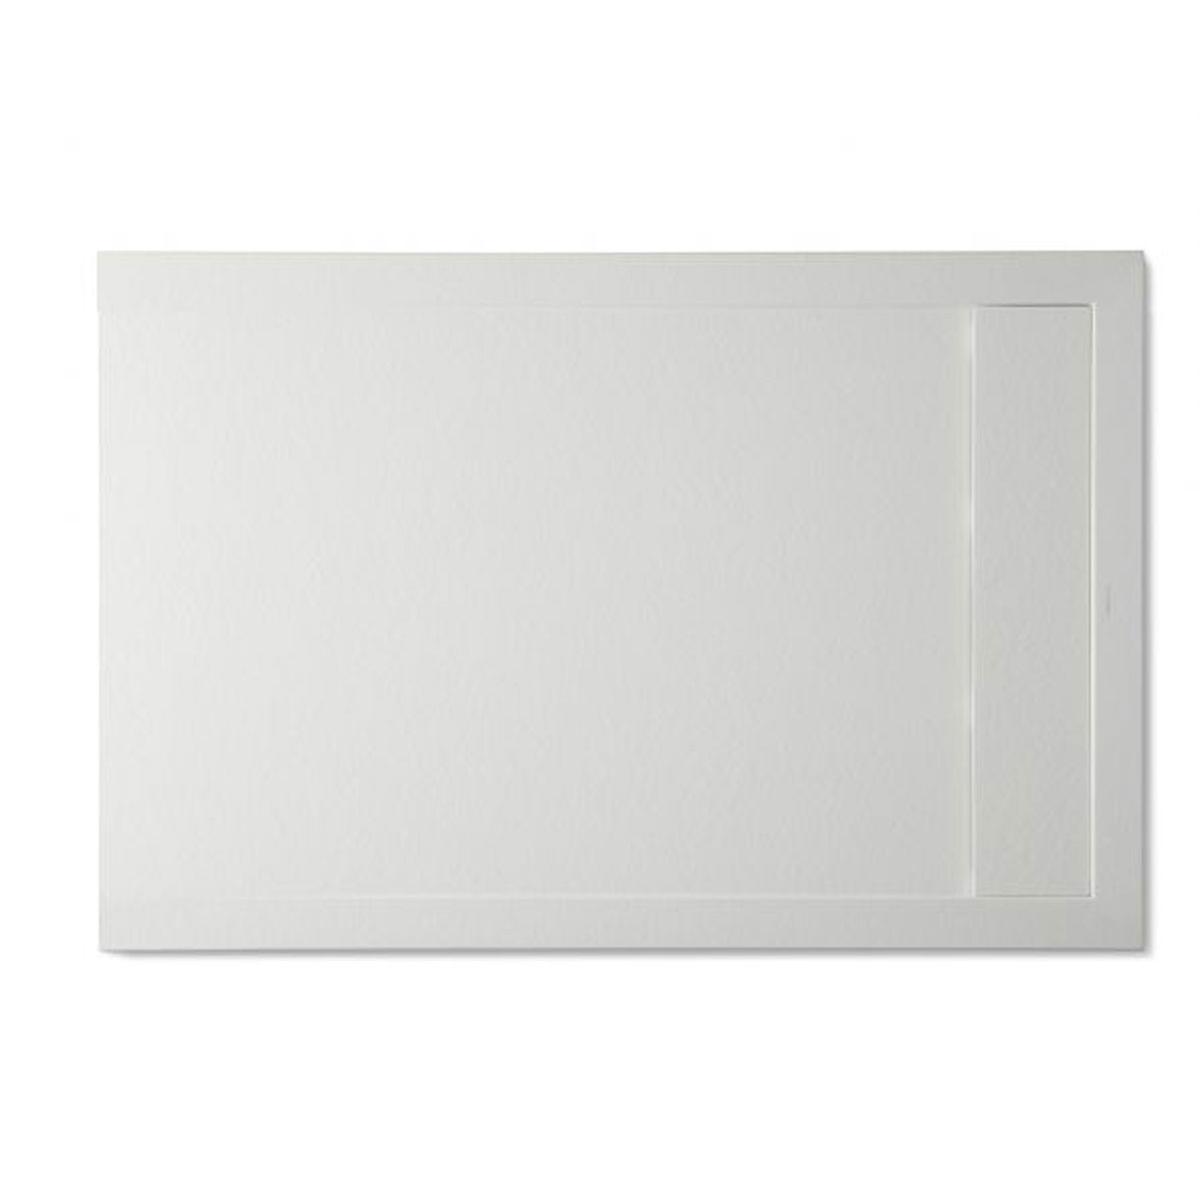 Plato de ducha rectangular 100x80 Andrómeda Stone Cover Blanco